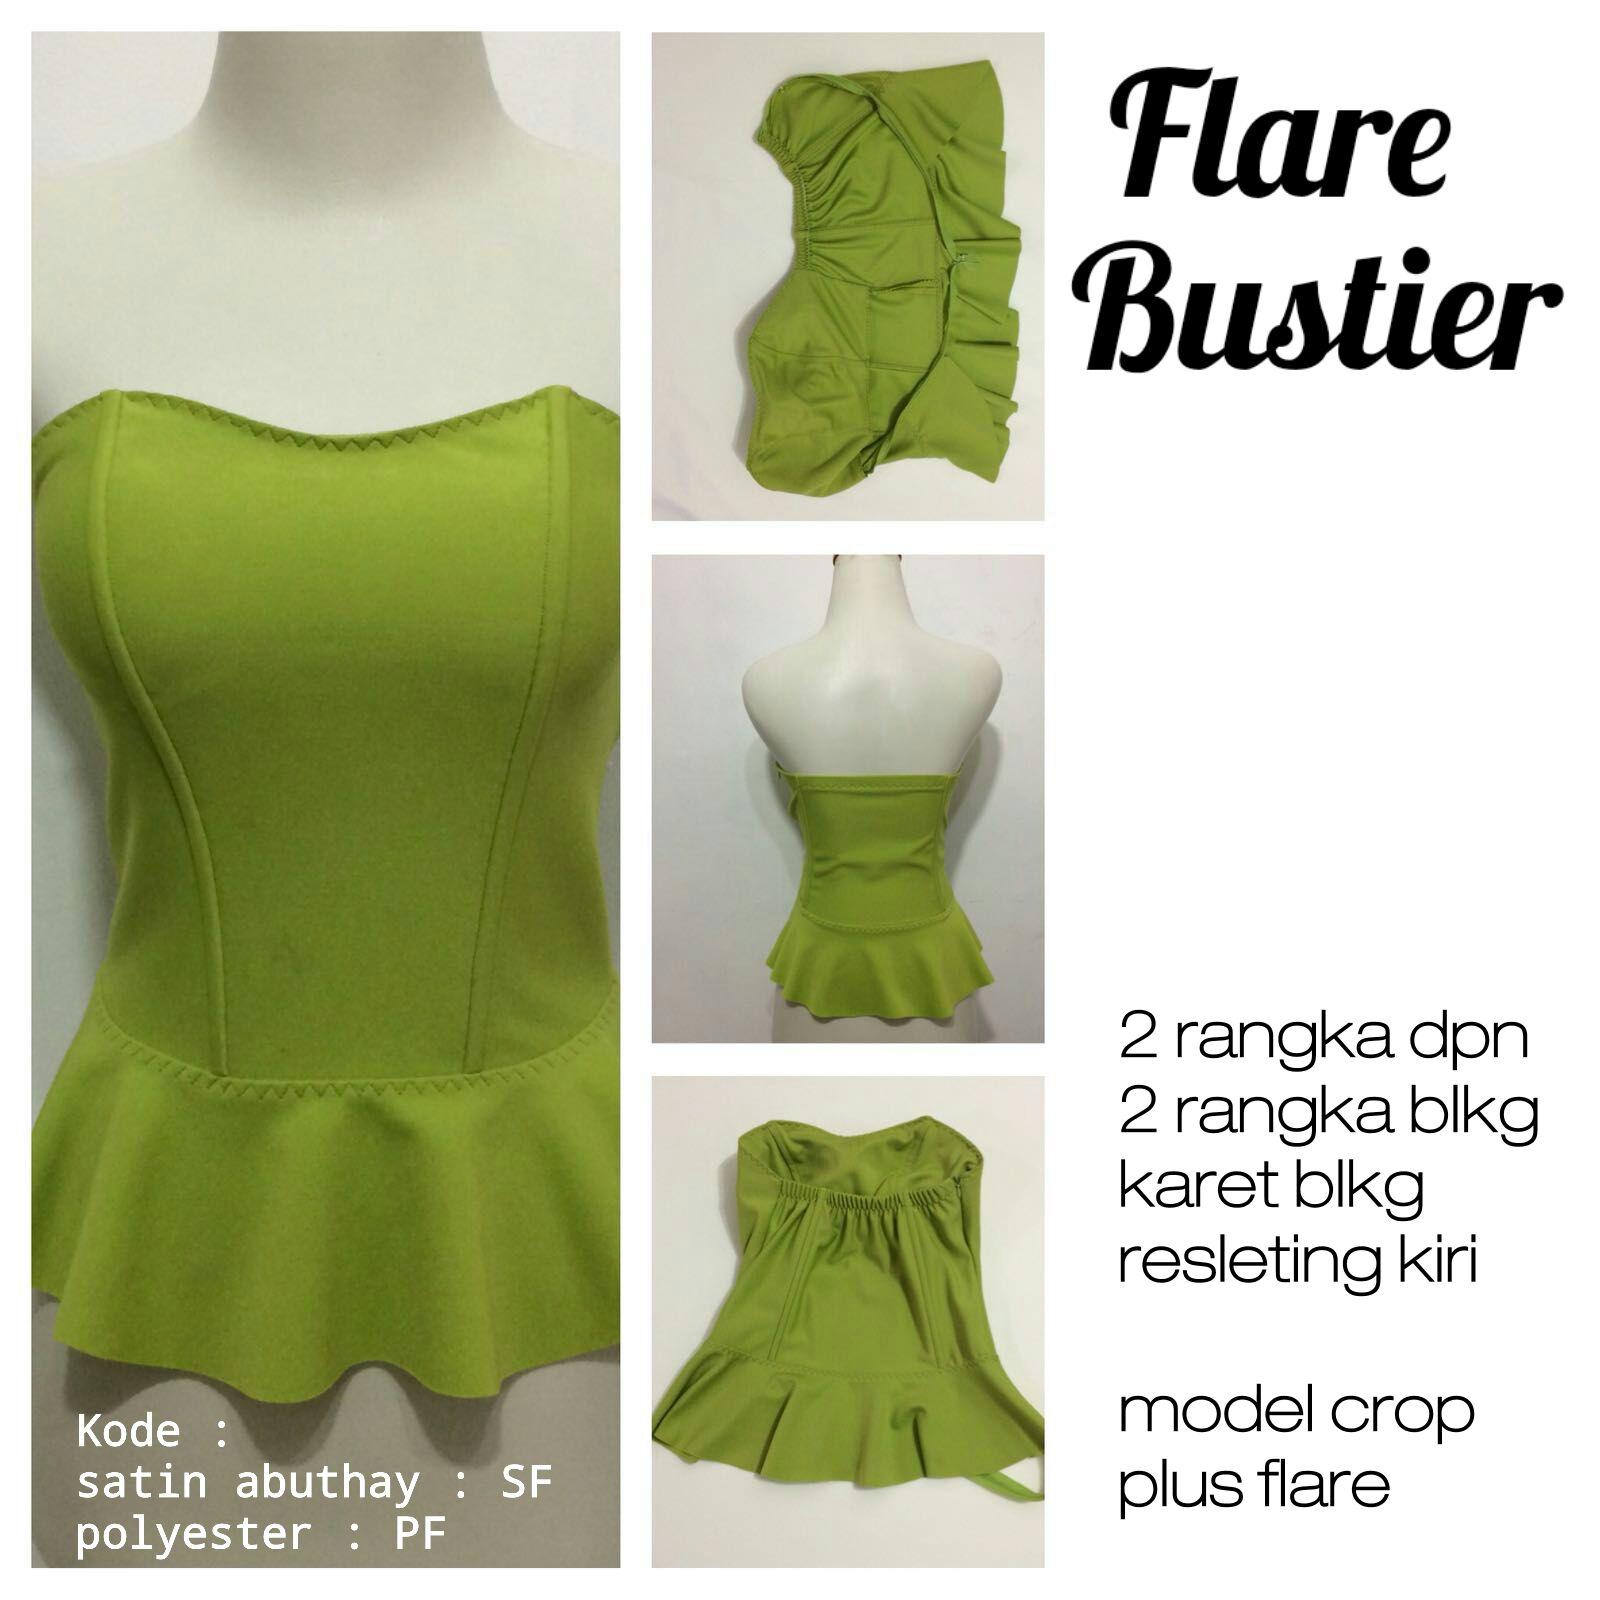 Bustier  jualan bustier murah tulang 4 cup flare hijau lumut polyester 3e04fccb5f